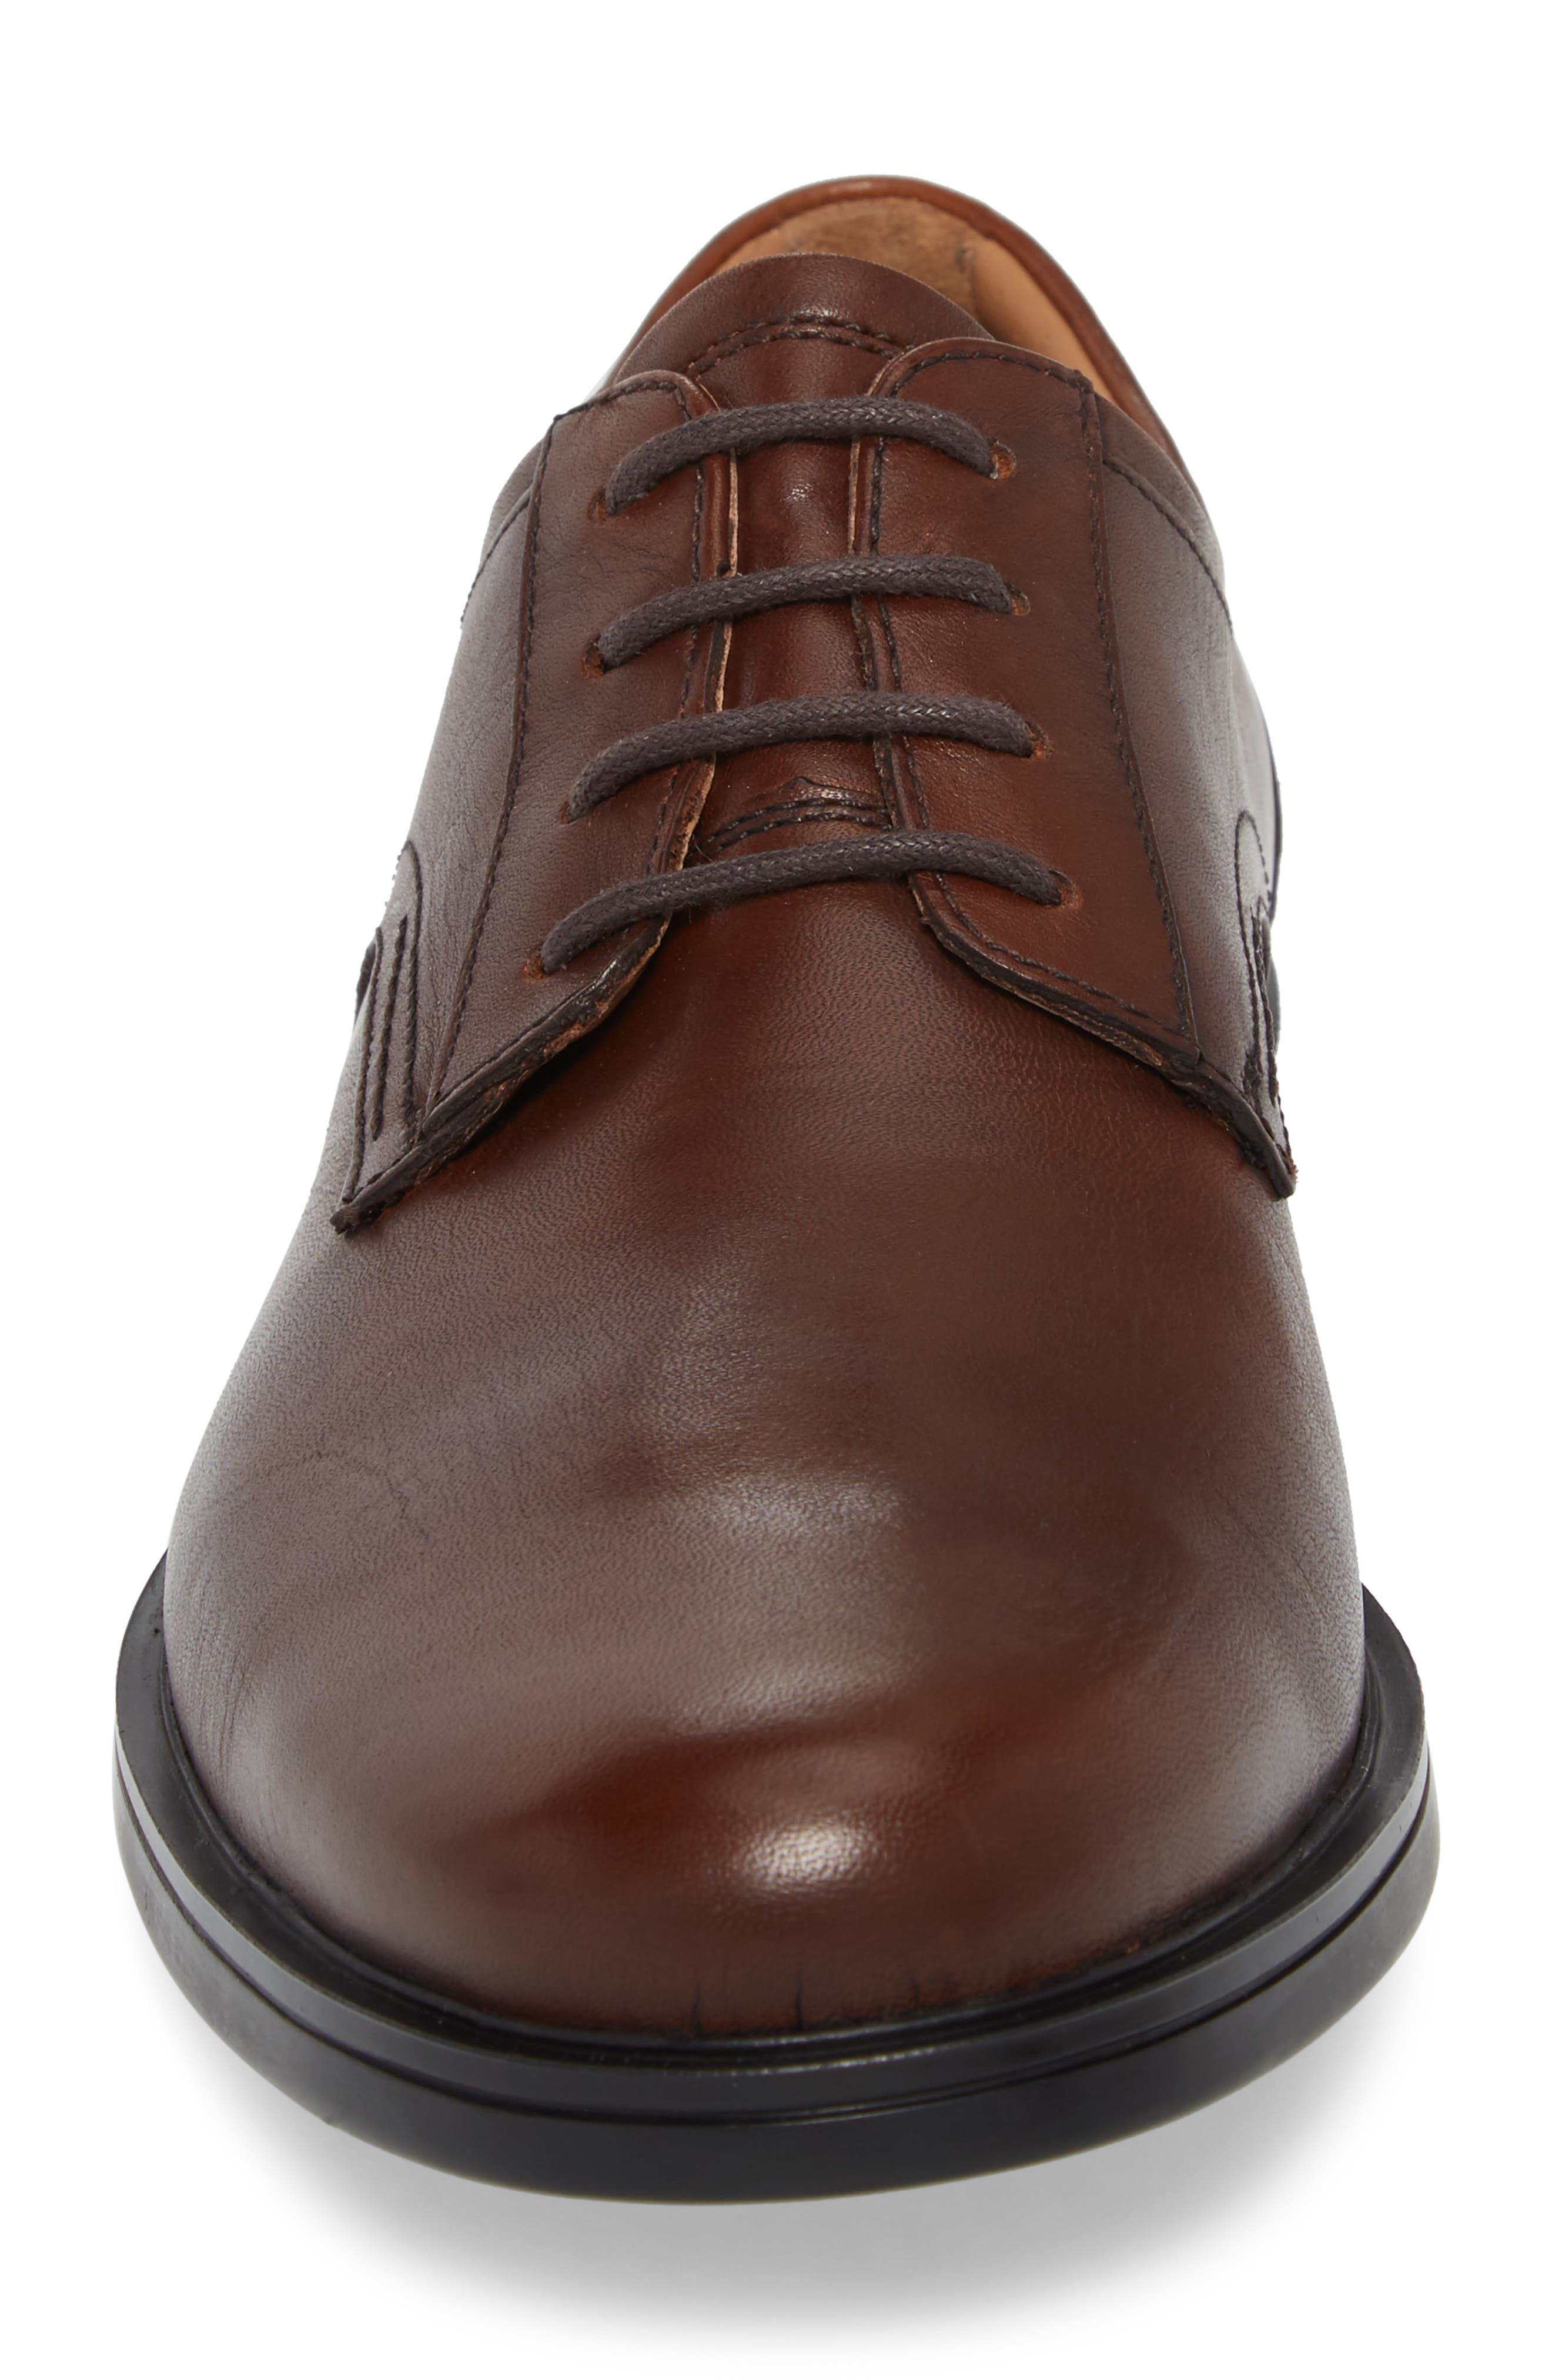 Unaldric Plain Toe Derby,                             Alternate thumbnail 4, color,                             Dark Tan Leather